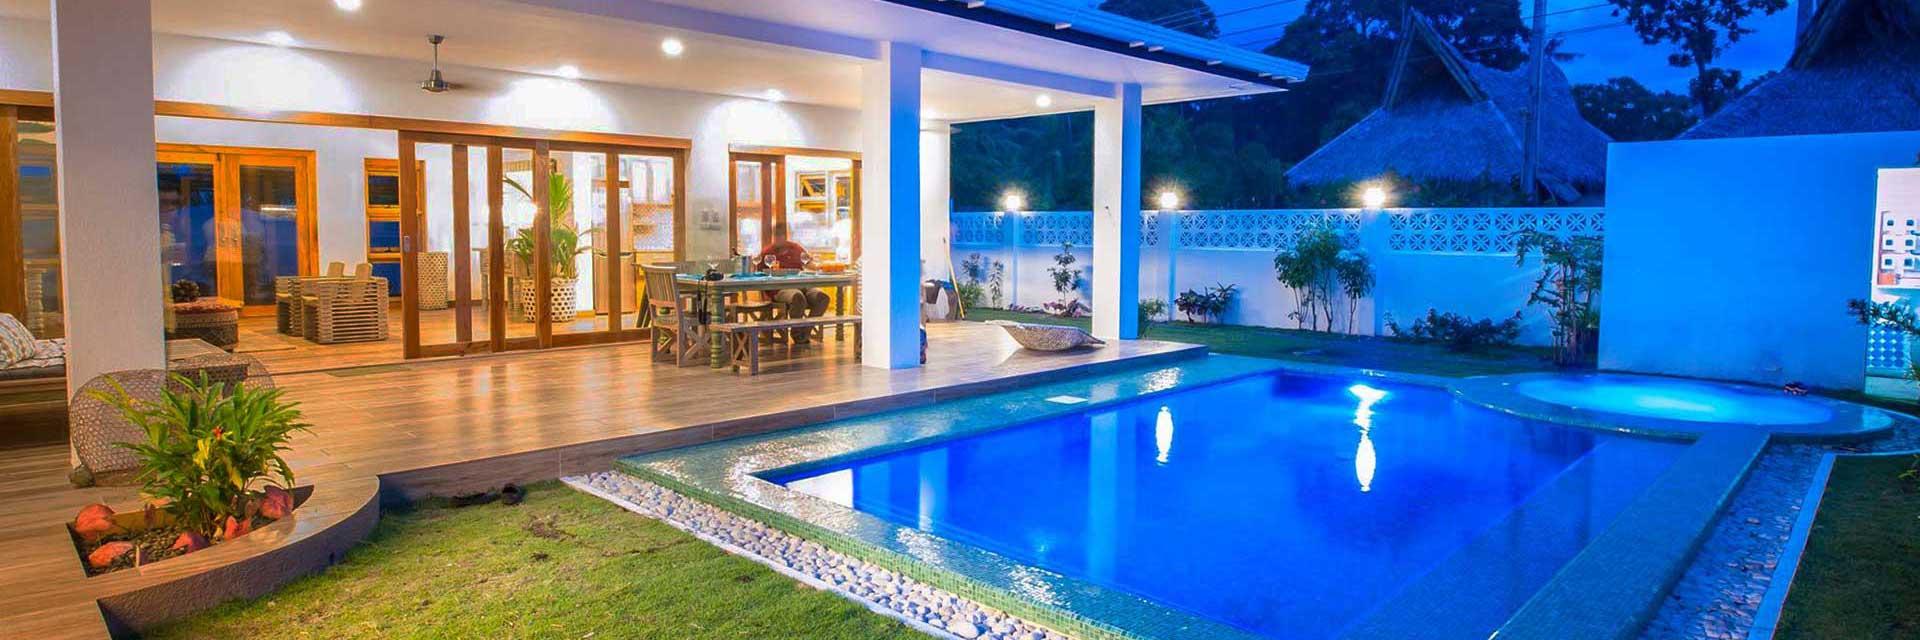 Vida Homes - Private Pool